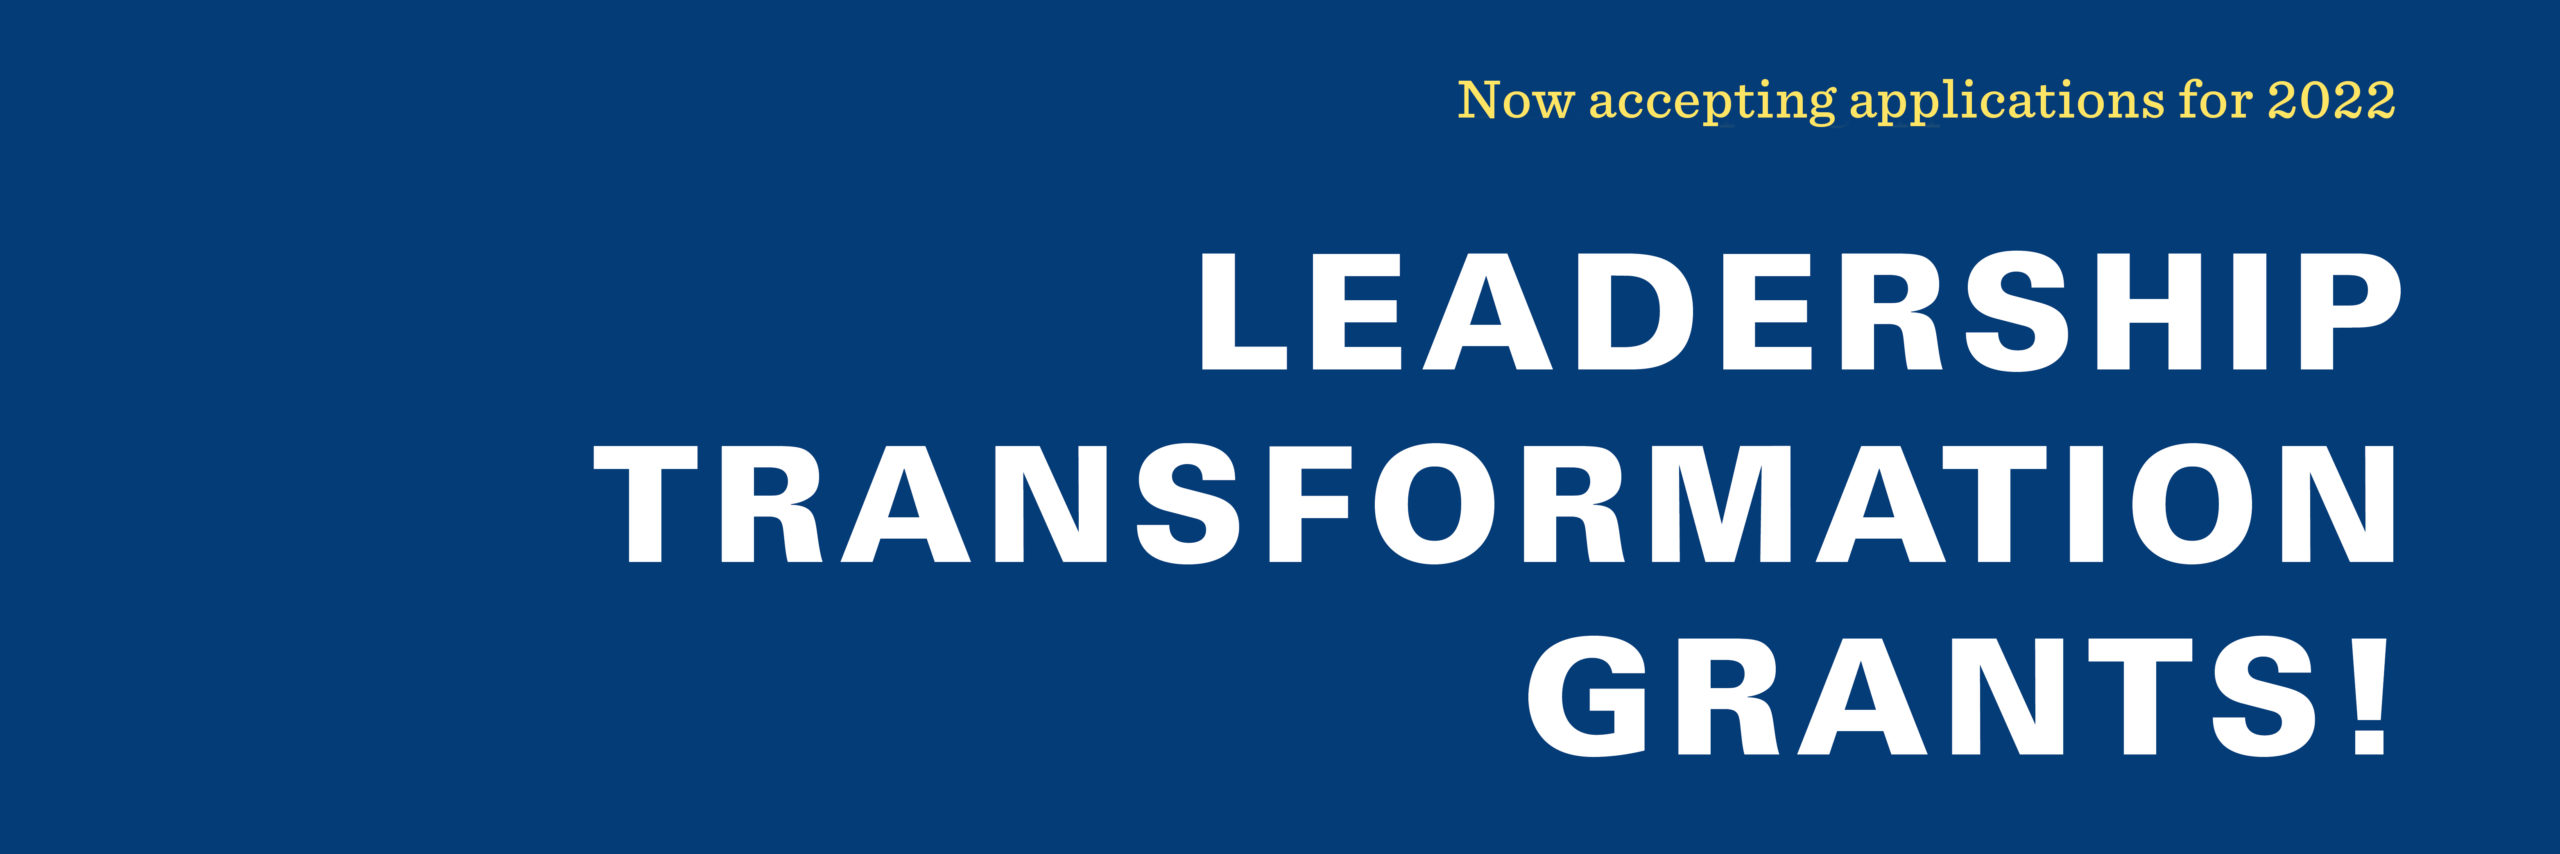 Leadership Transformation Grant Application